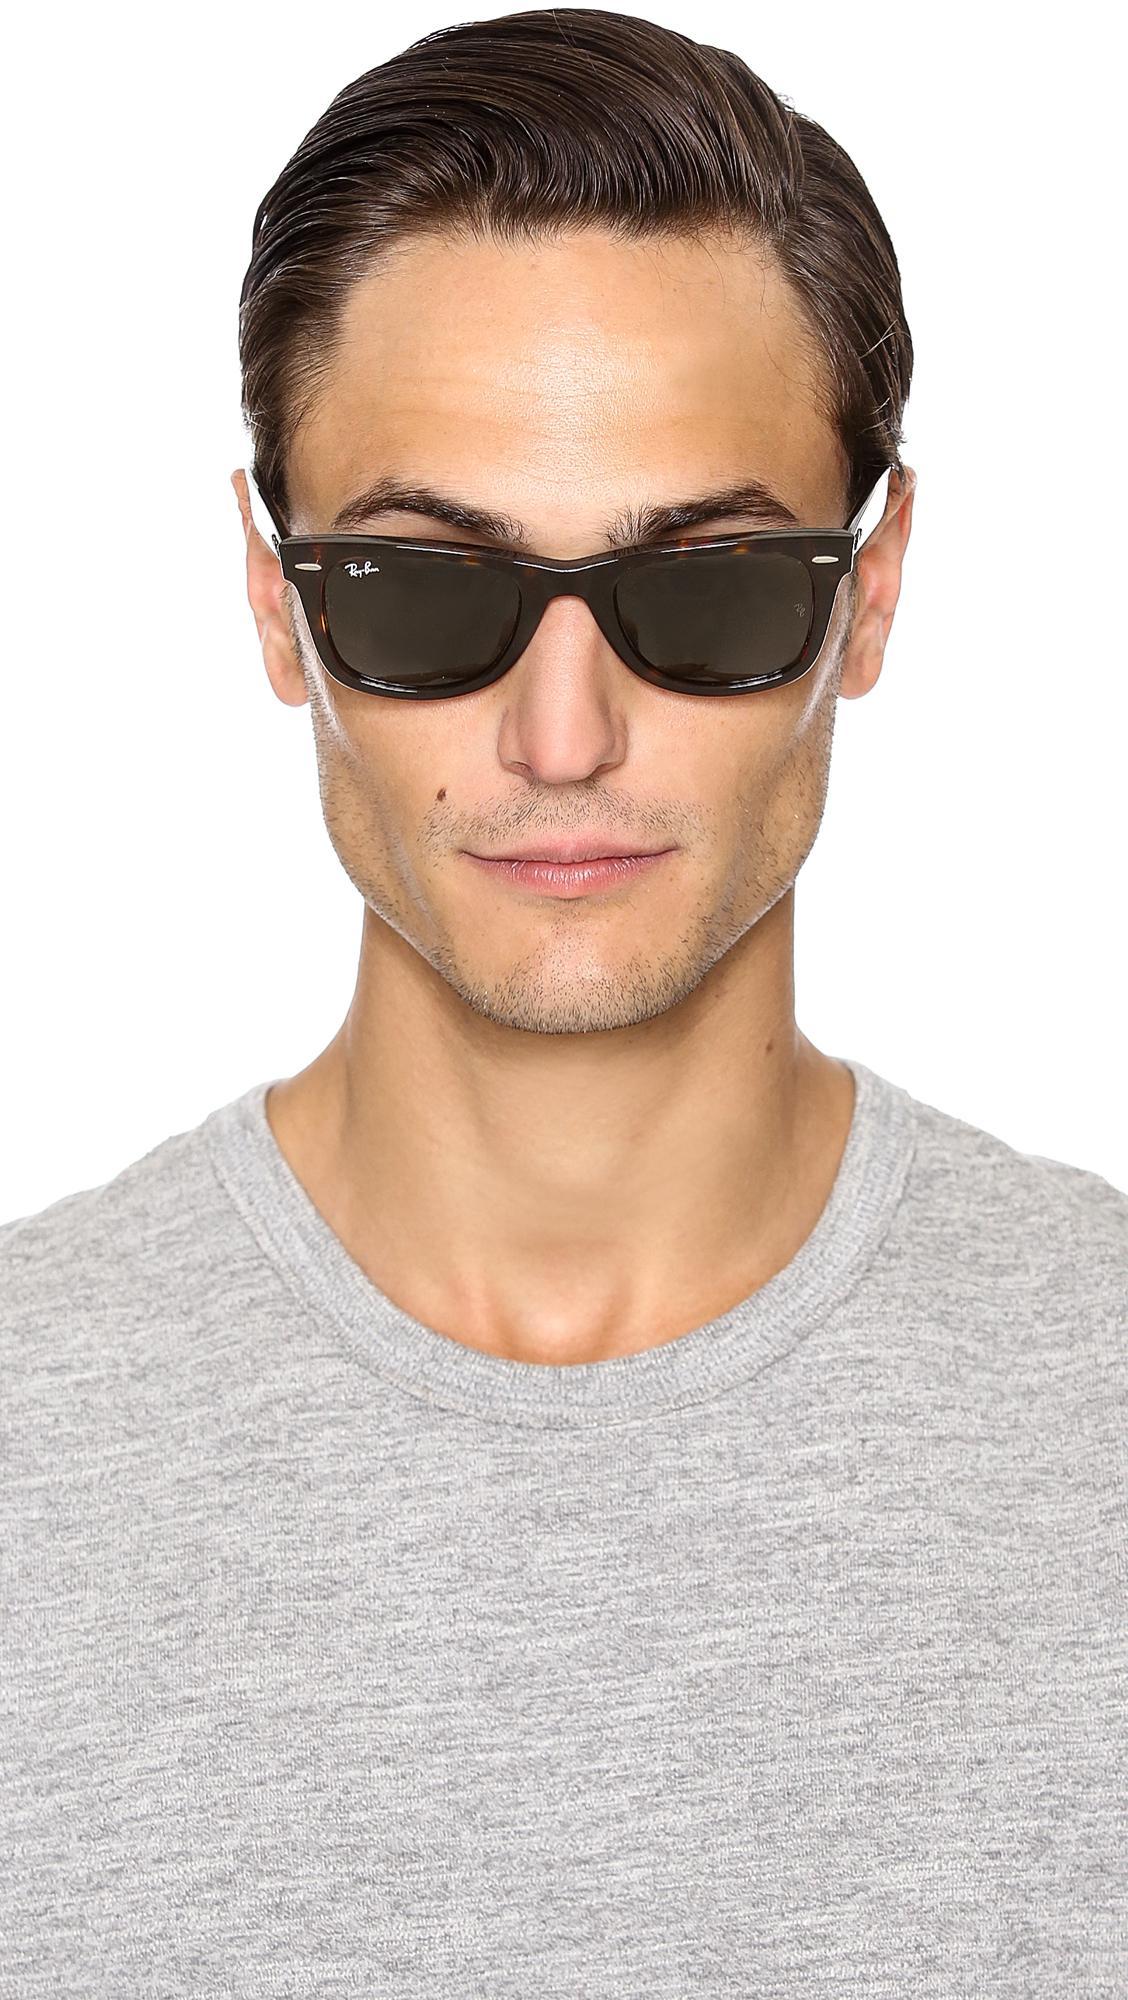 081141404da Gallery. Previously sold at  East Dane · Men s Wayfarer Sunglasses Men s Ray  Ban ...